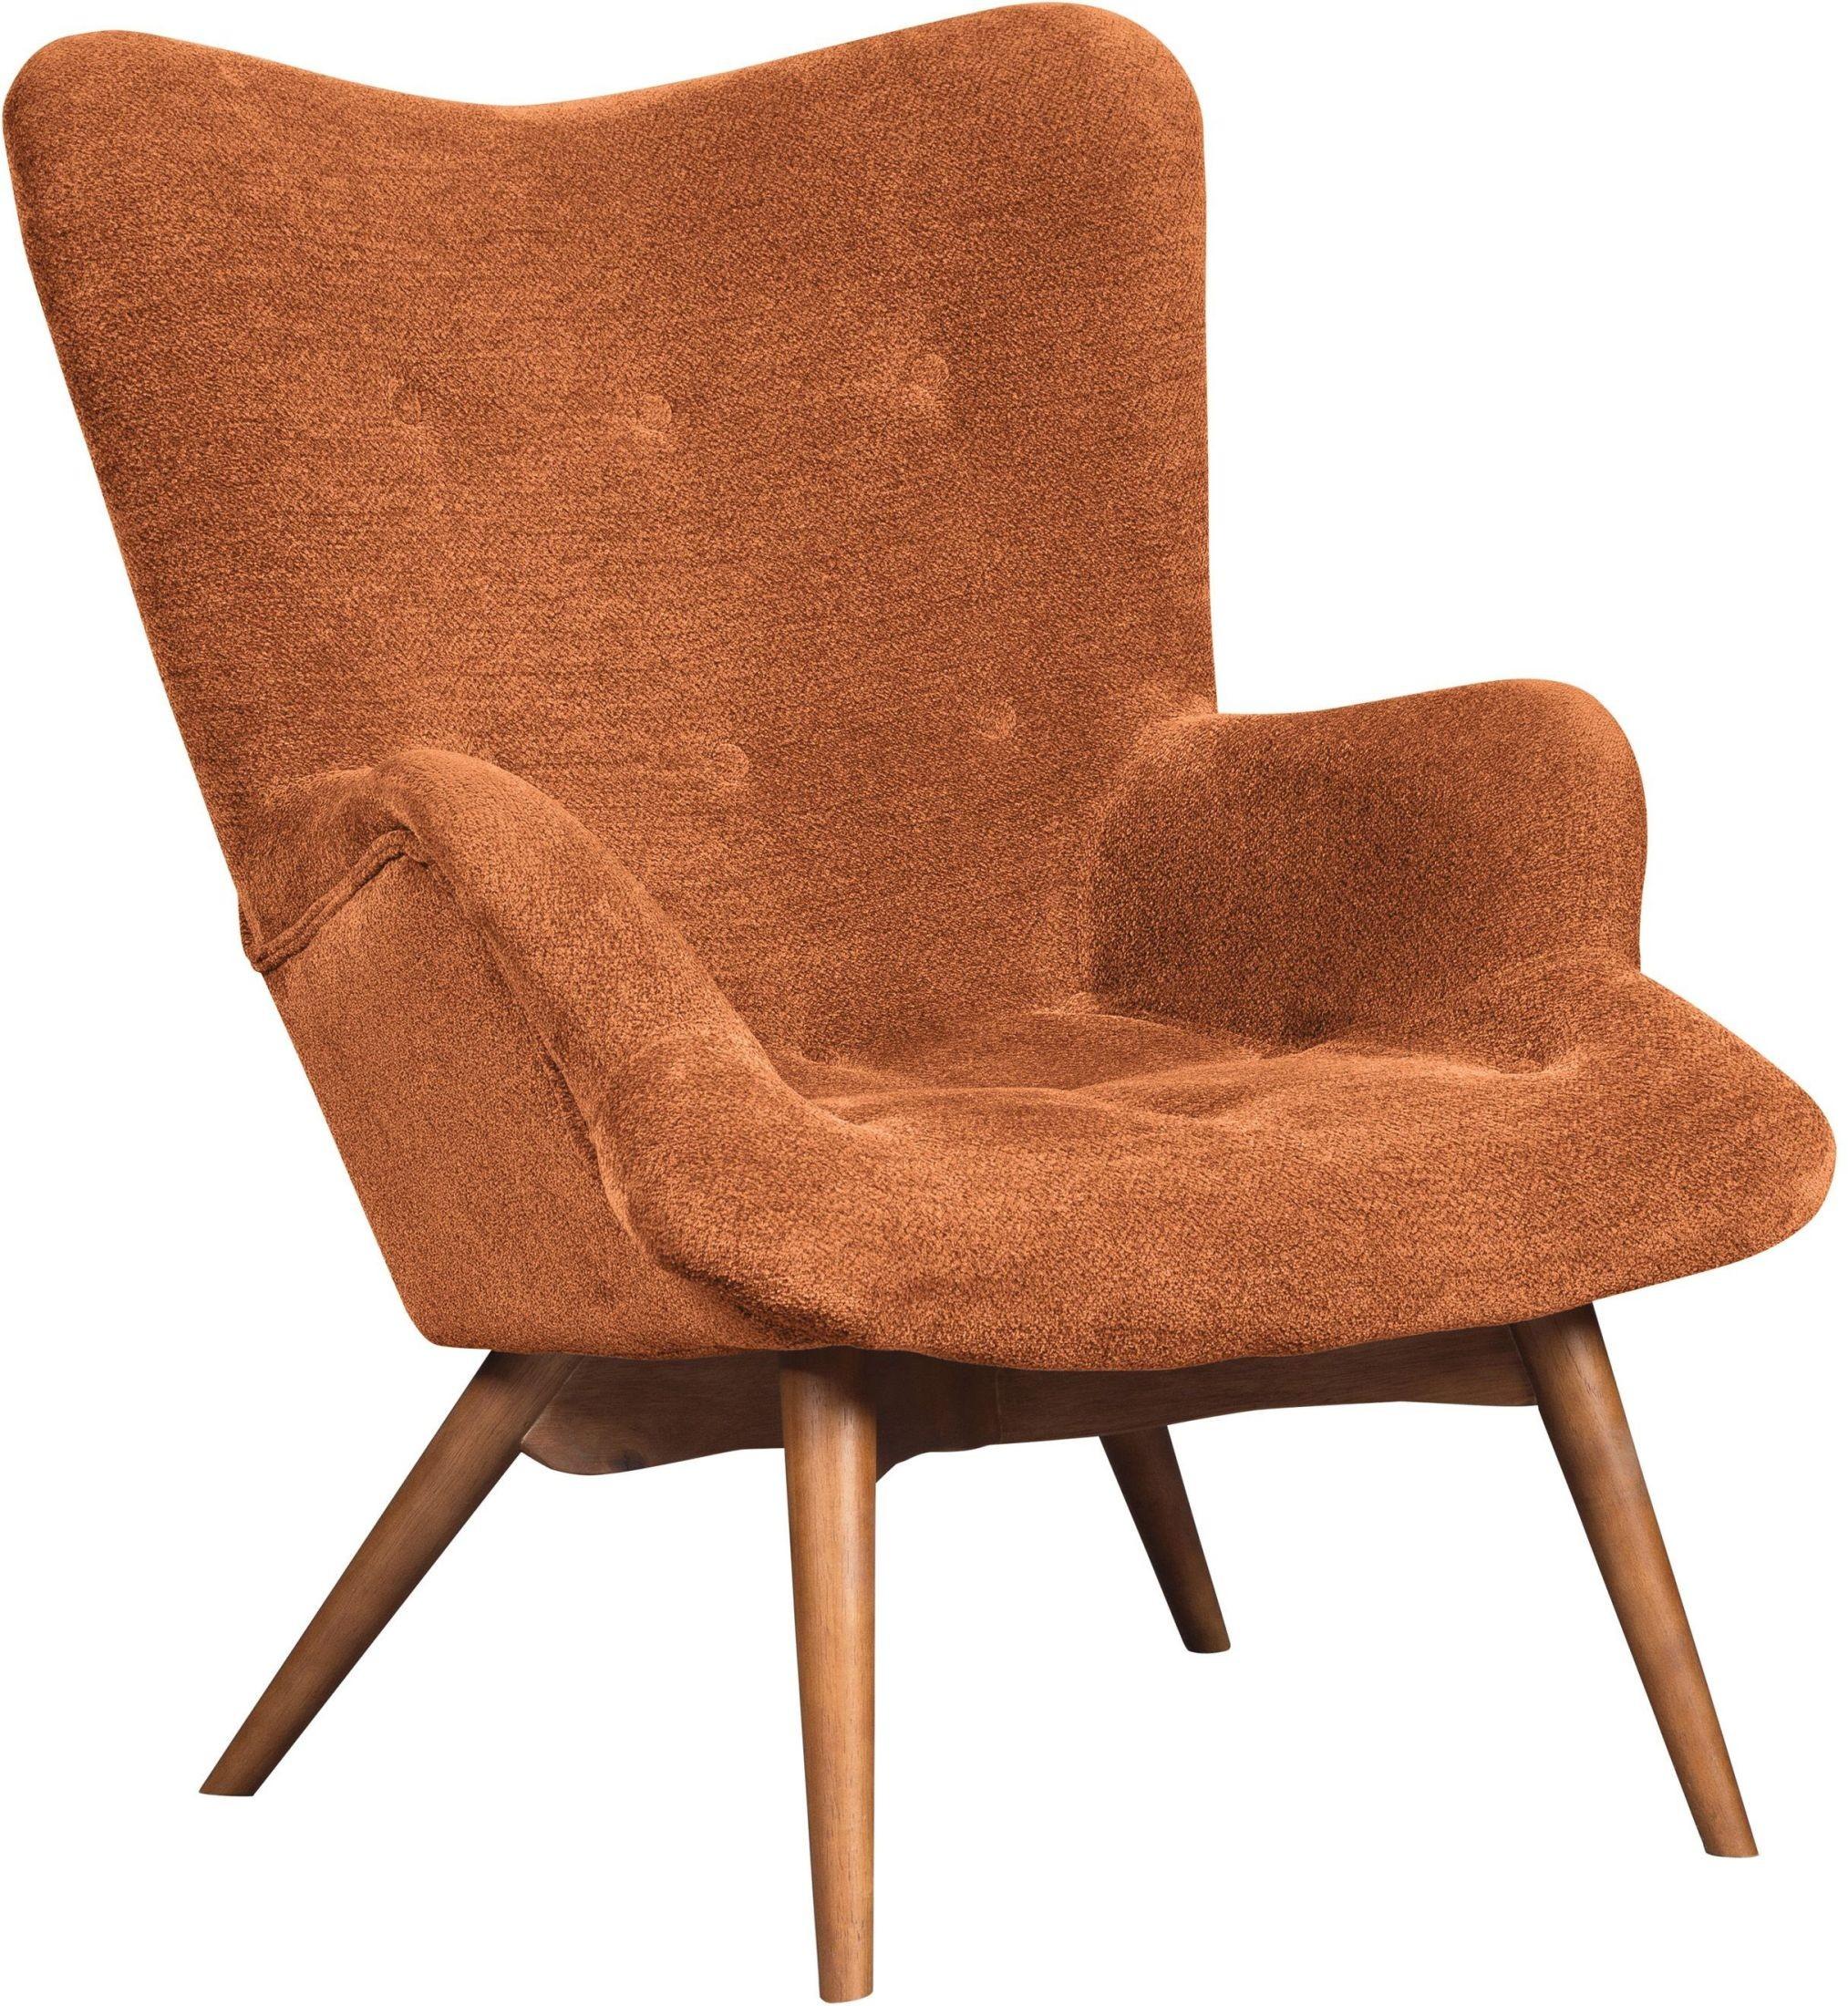 Pelsor Orange Accent Chair 6340361 Ashley